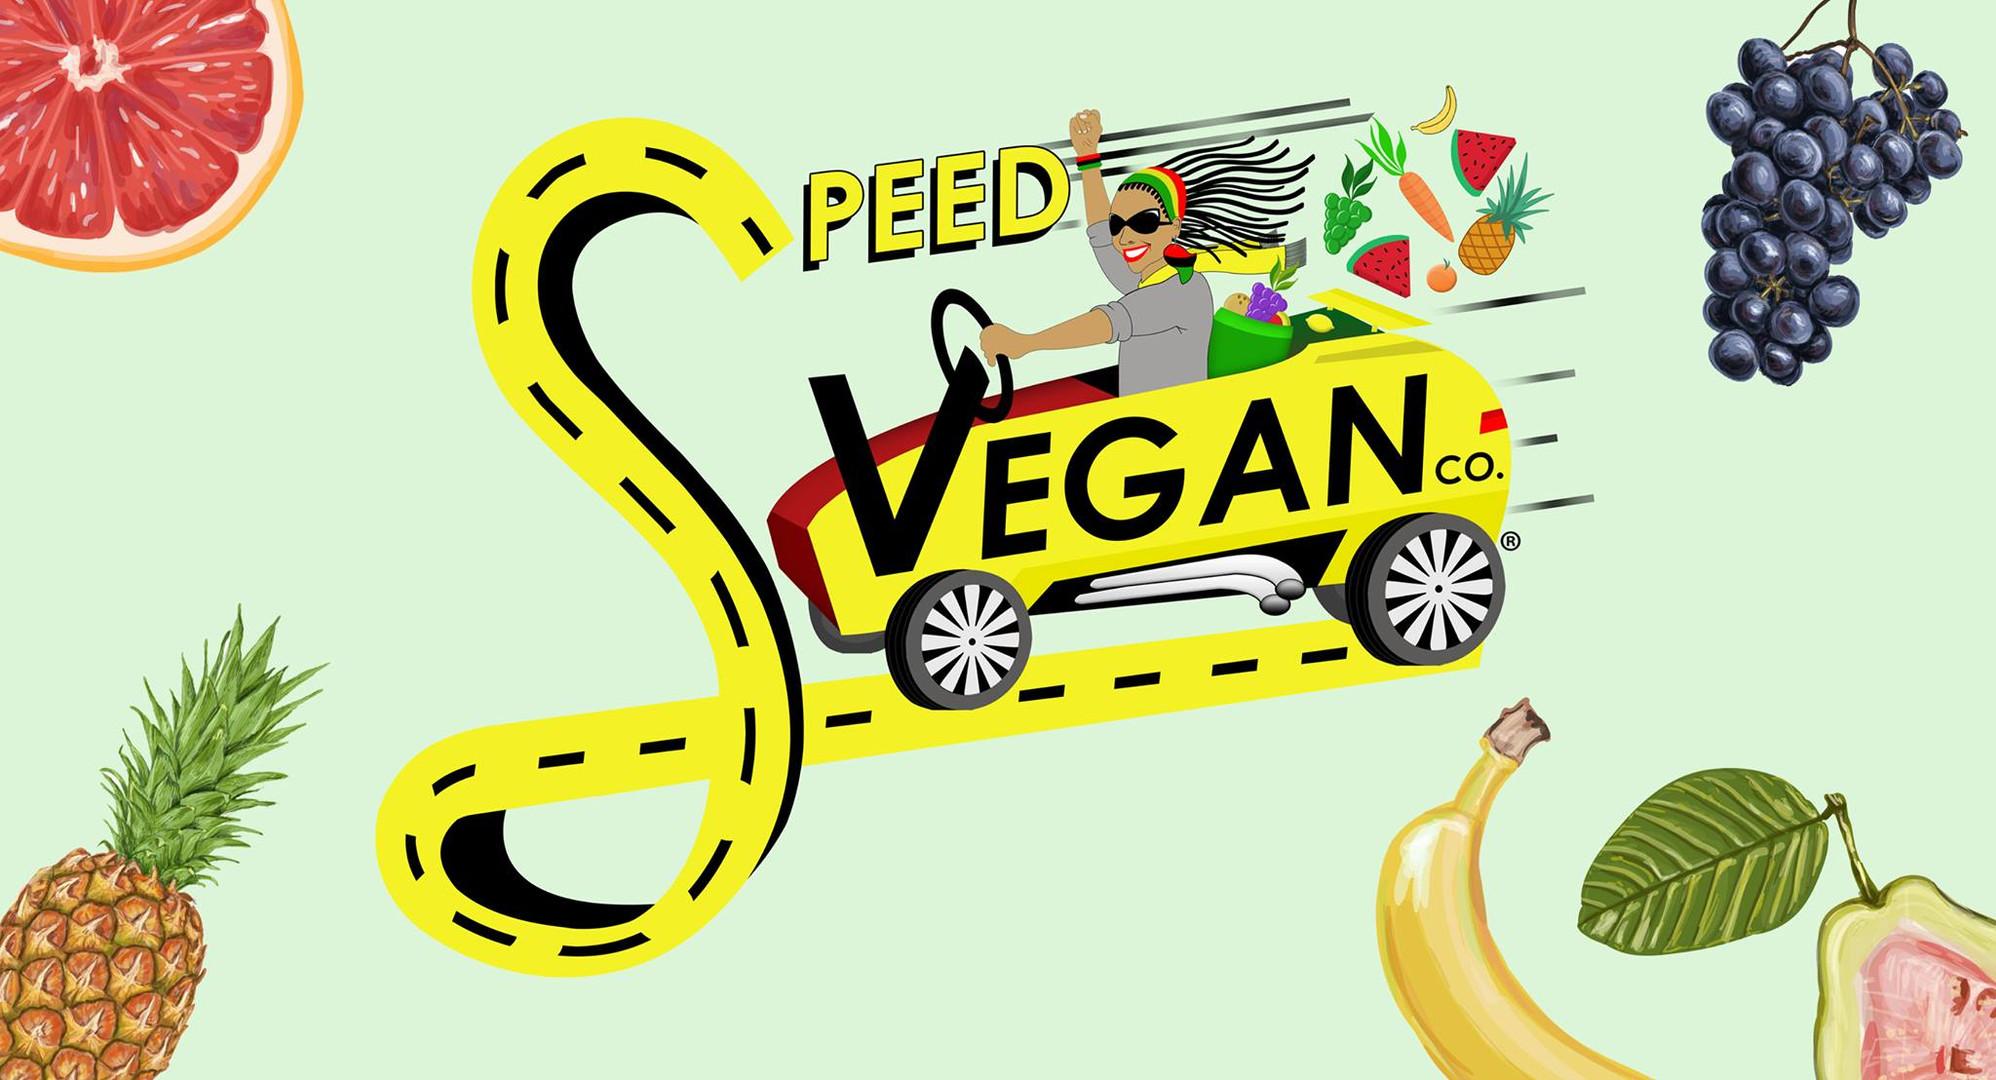 Speed Vegan